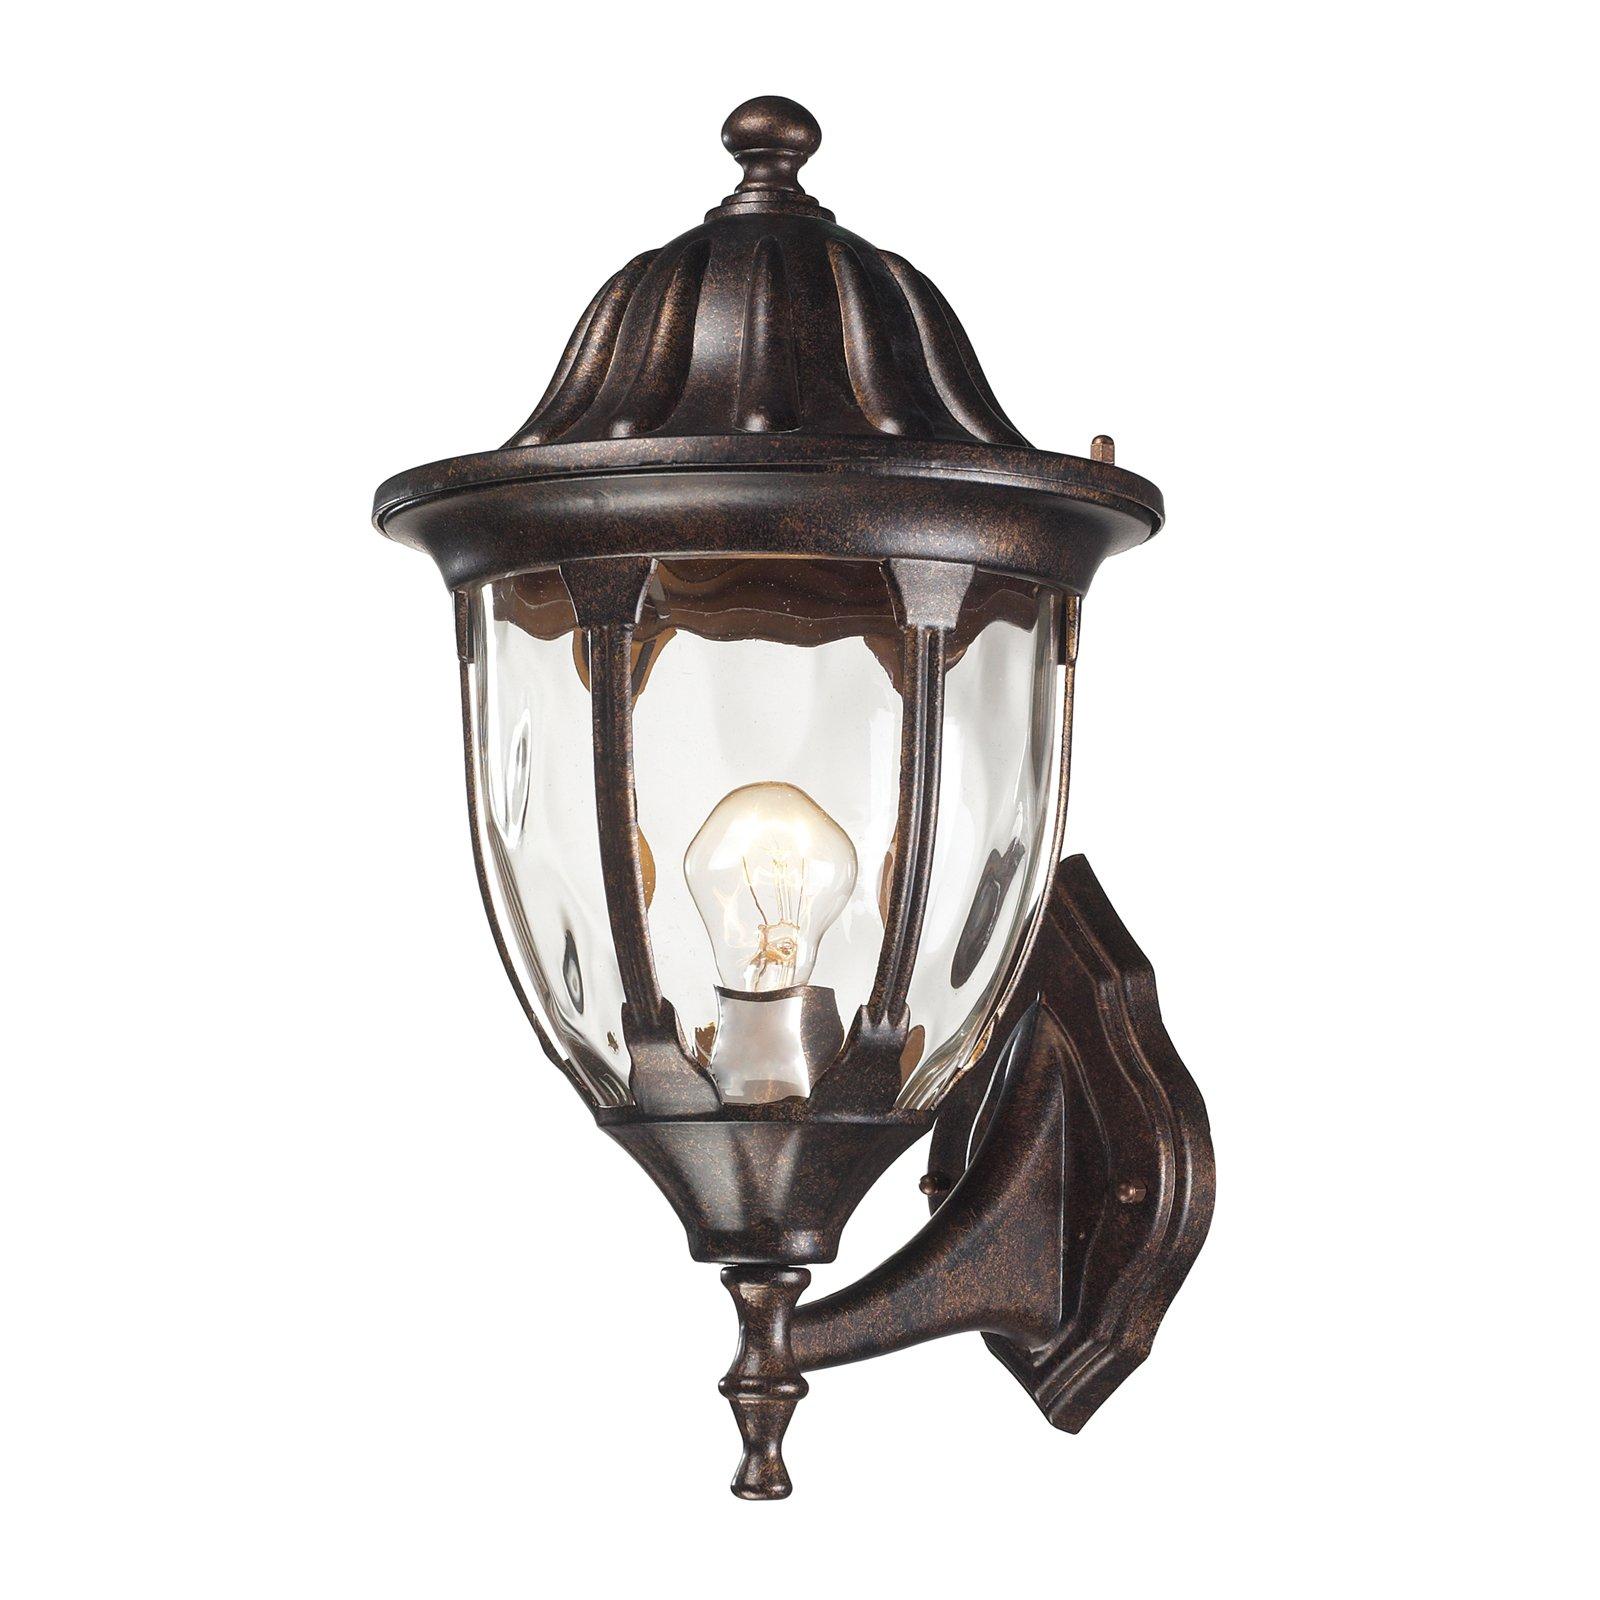 ELK Lighting Glendale 45001/1 1-Light Outdoor Wall Sconce